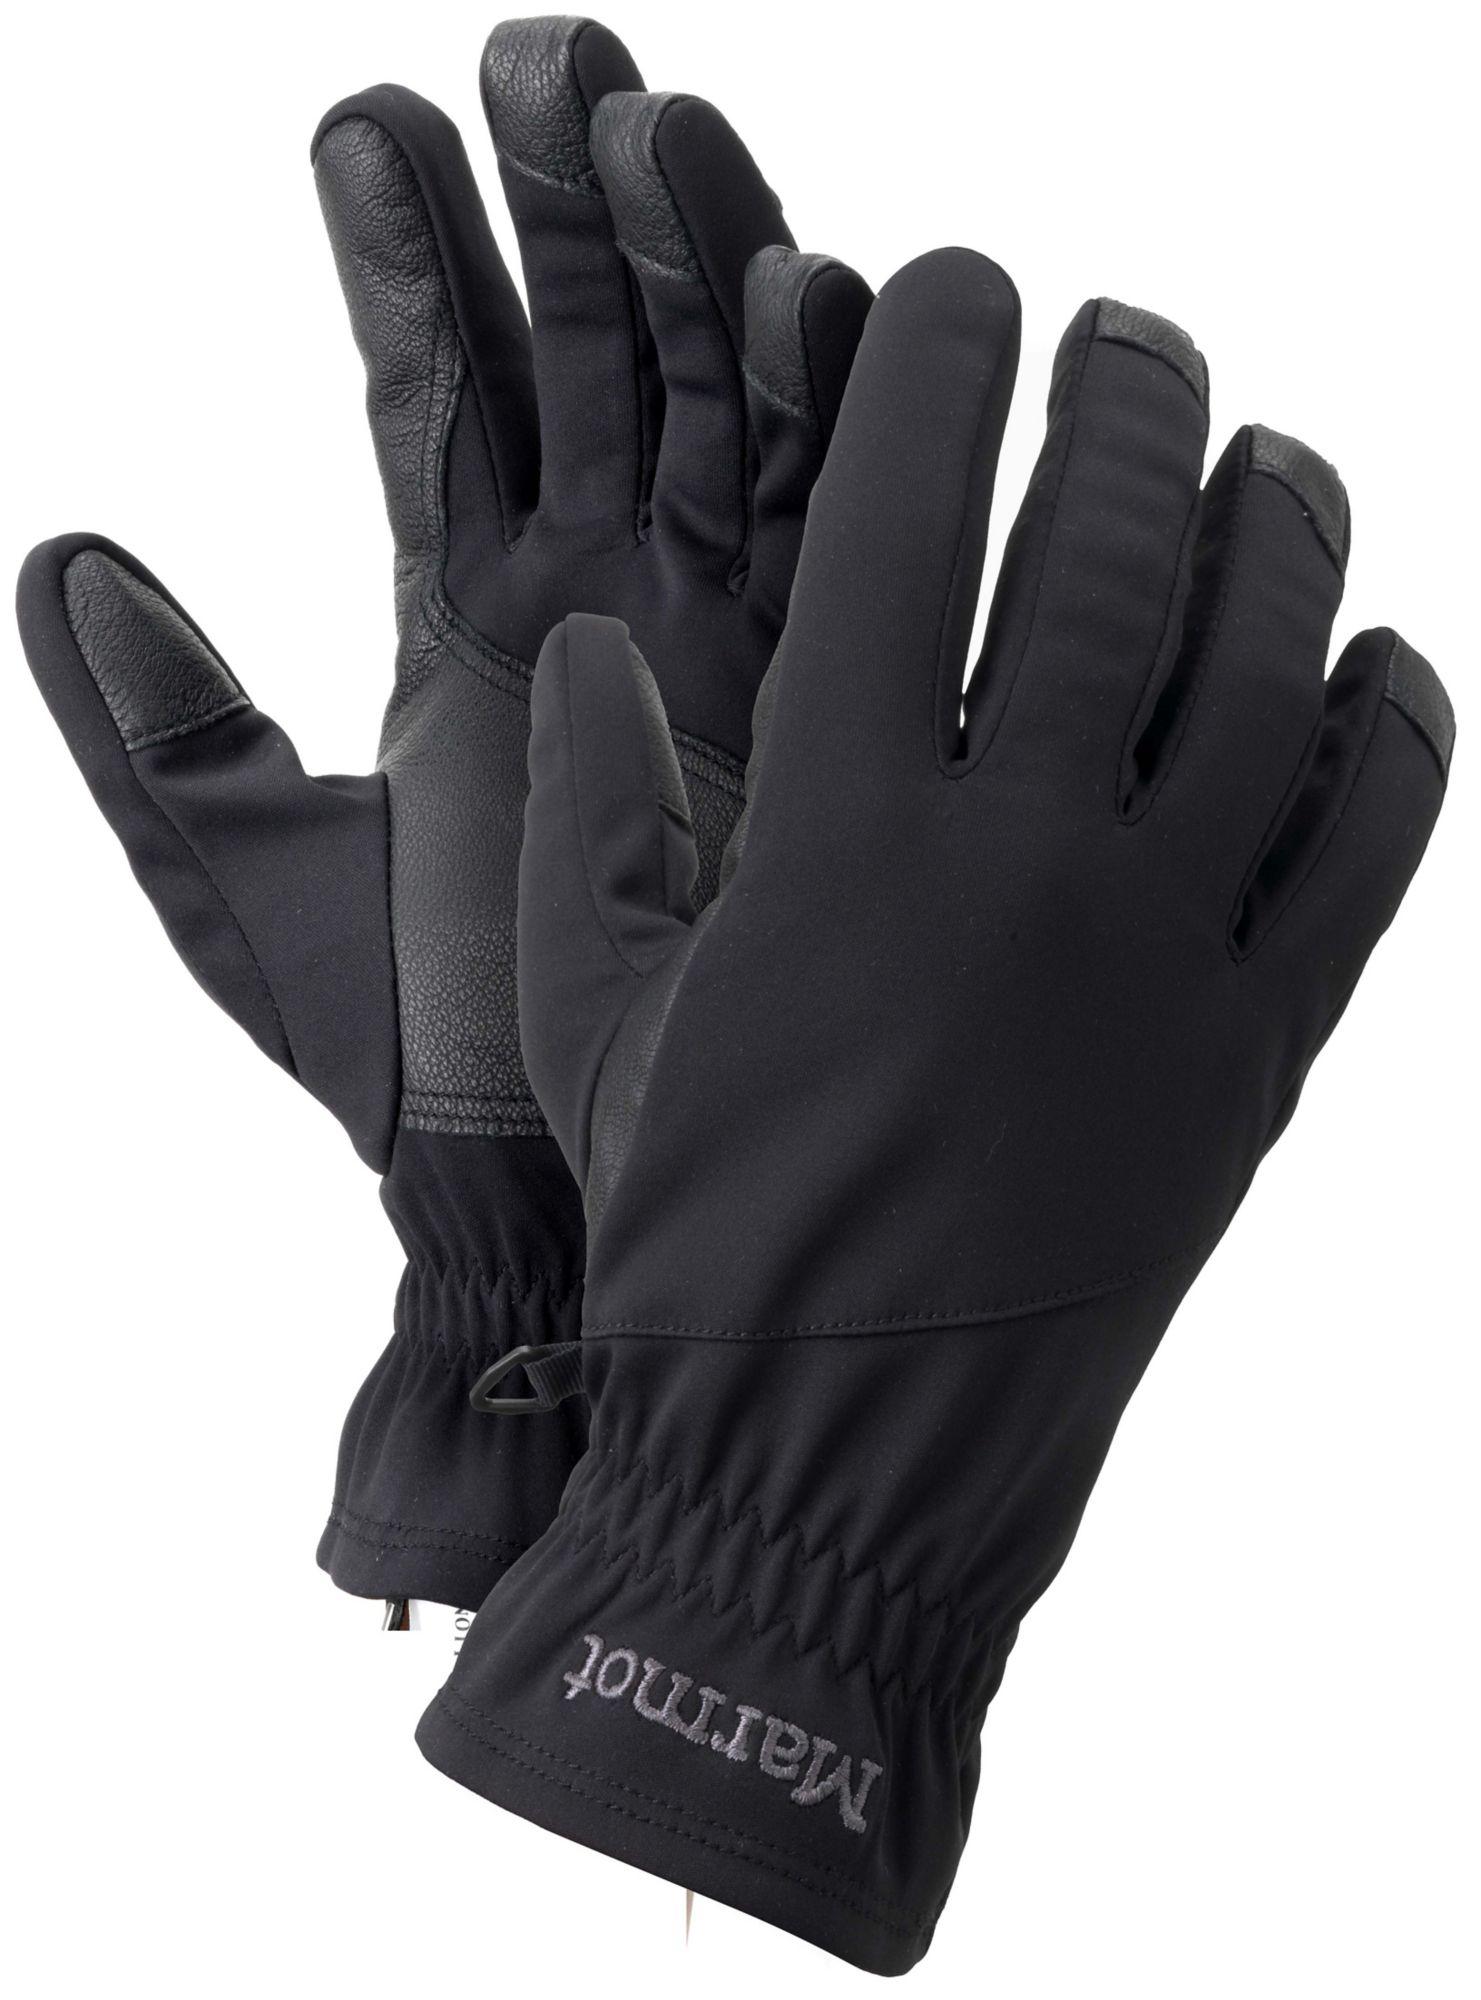 Evolution Glove Black